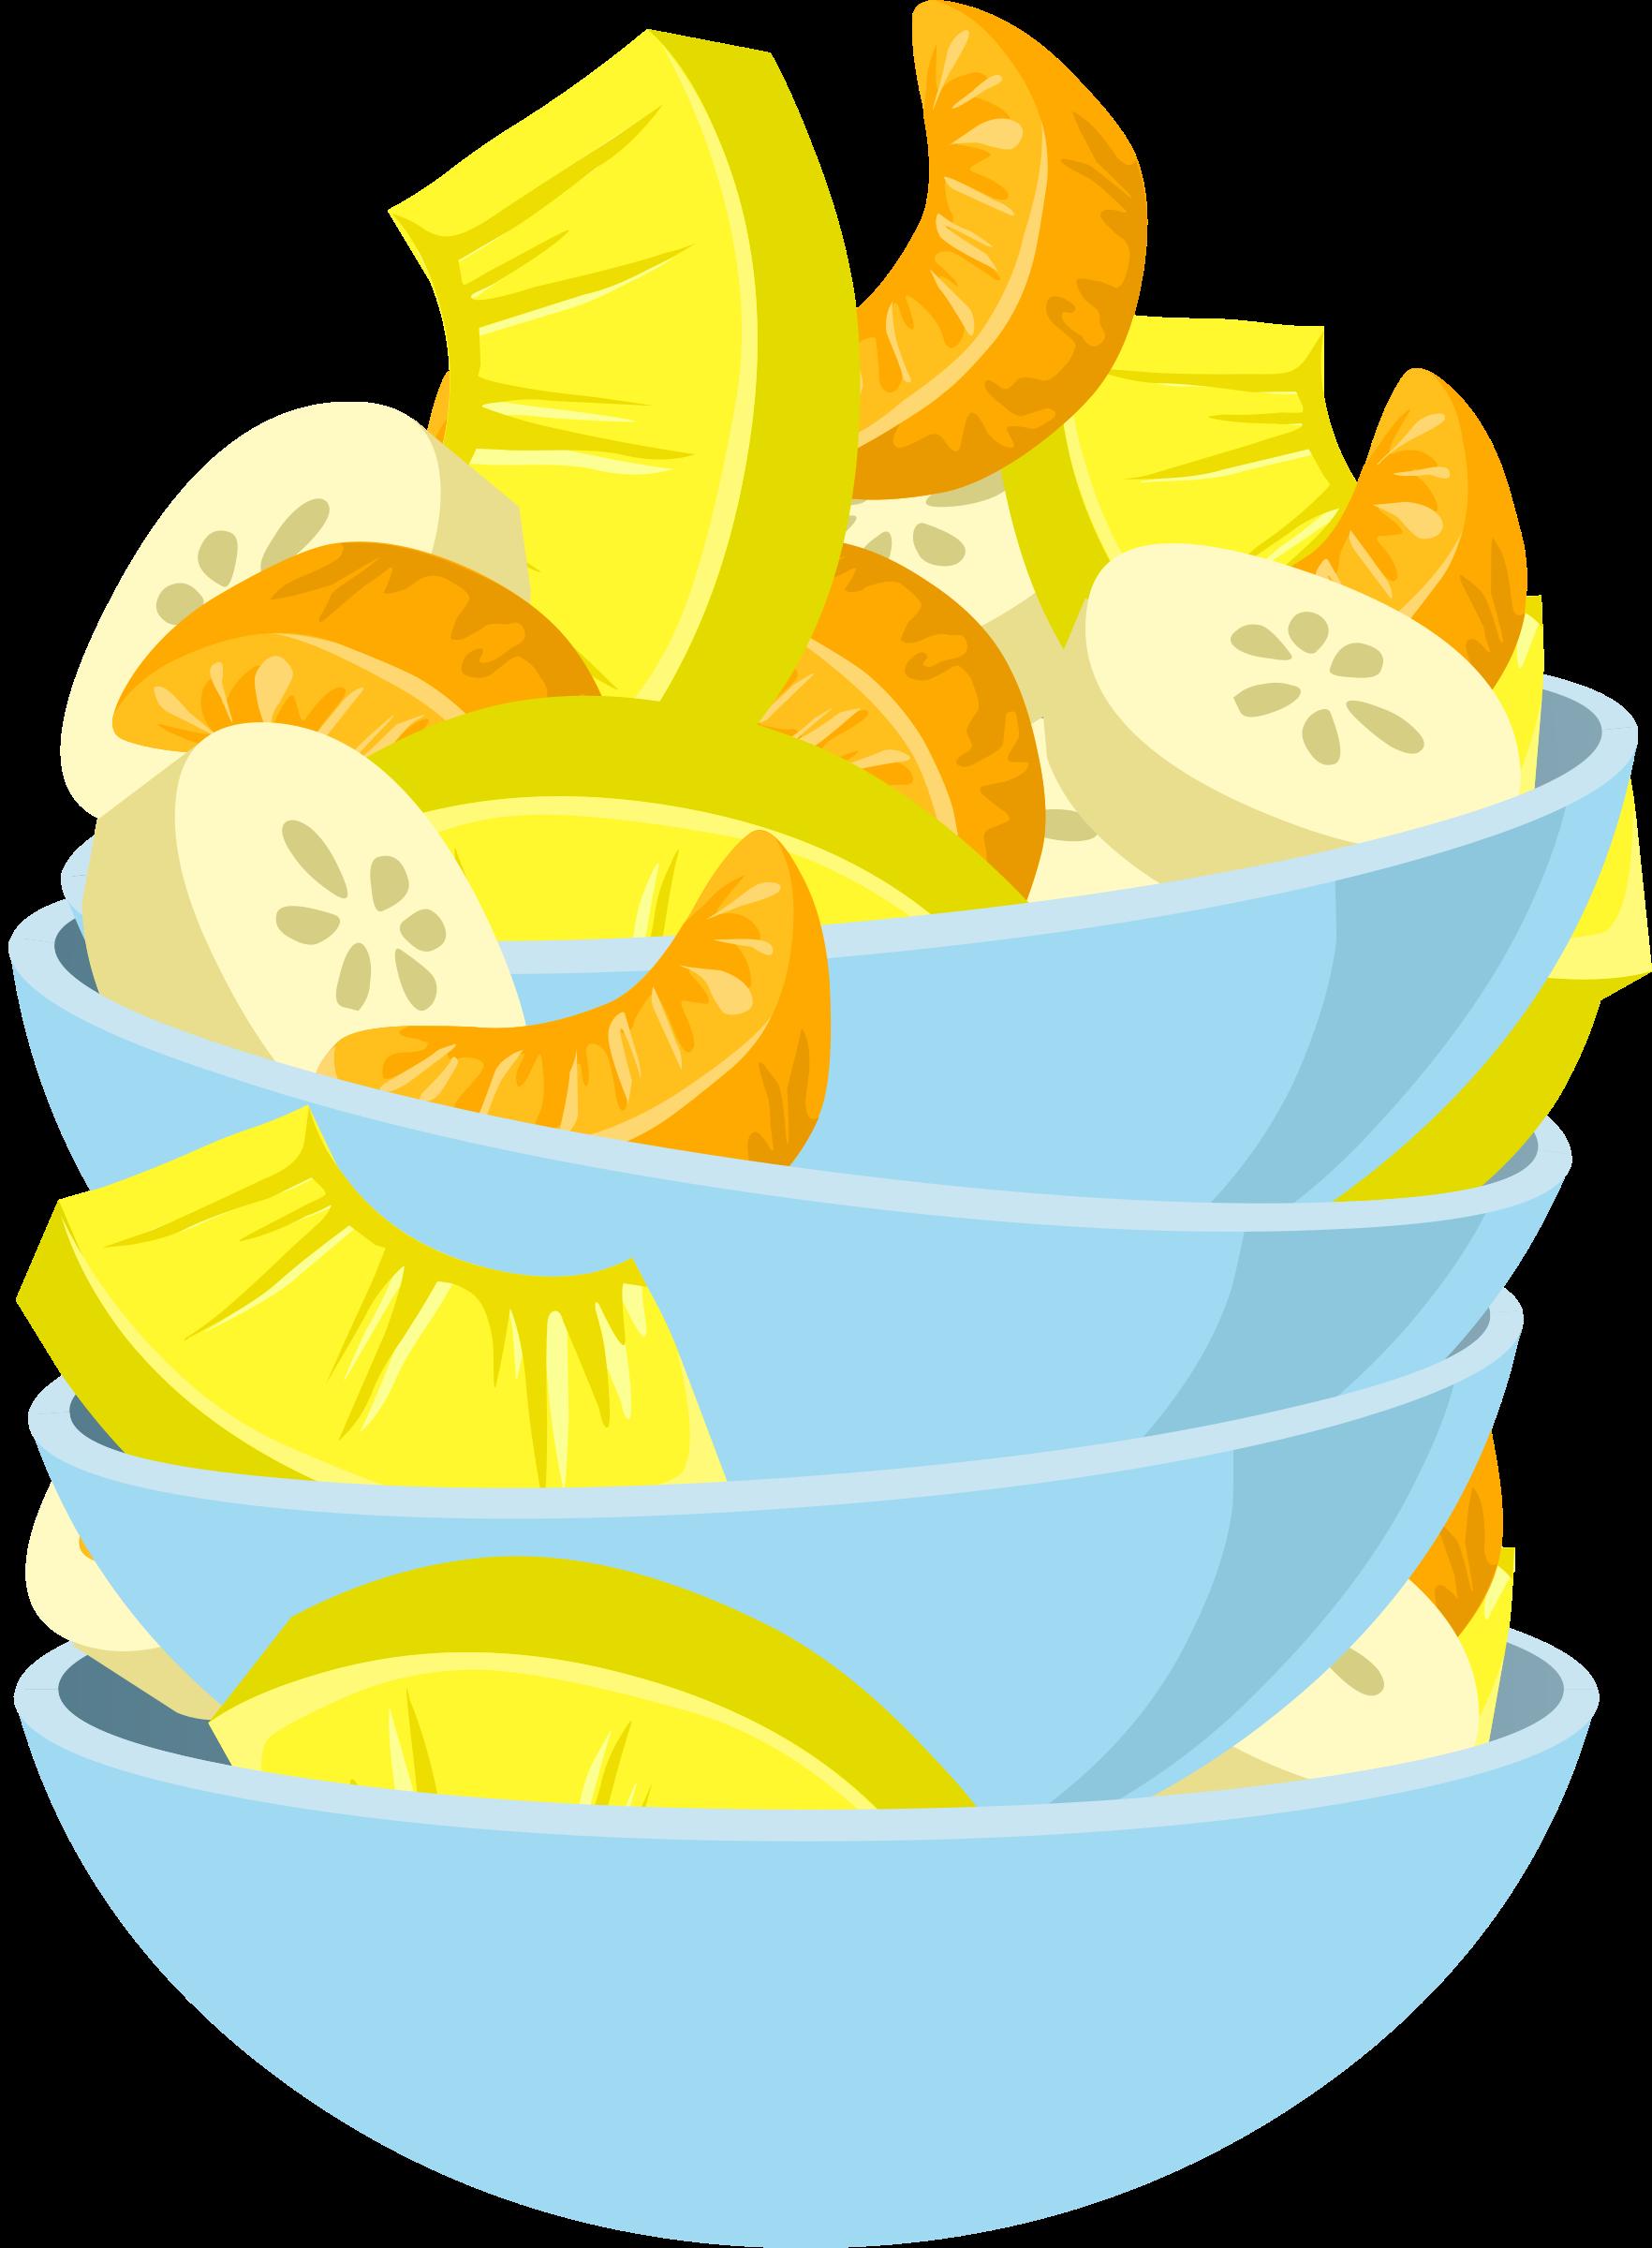 Fruit clipart food. Exotic salad big image